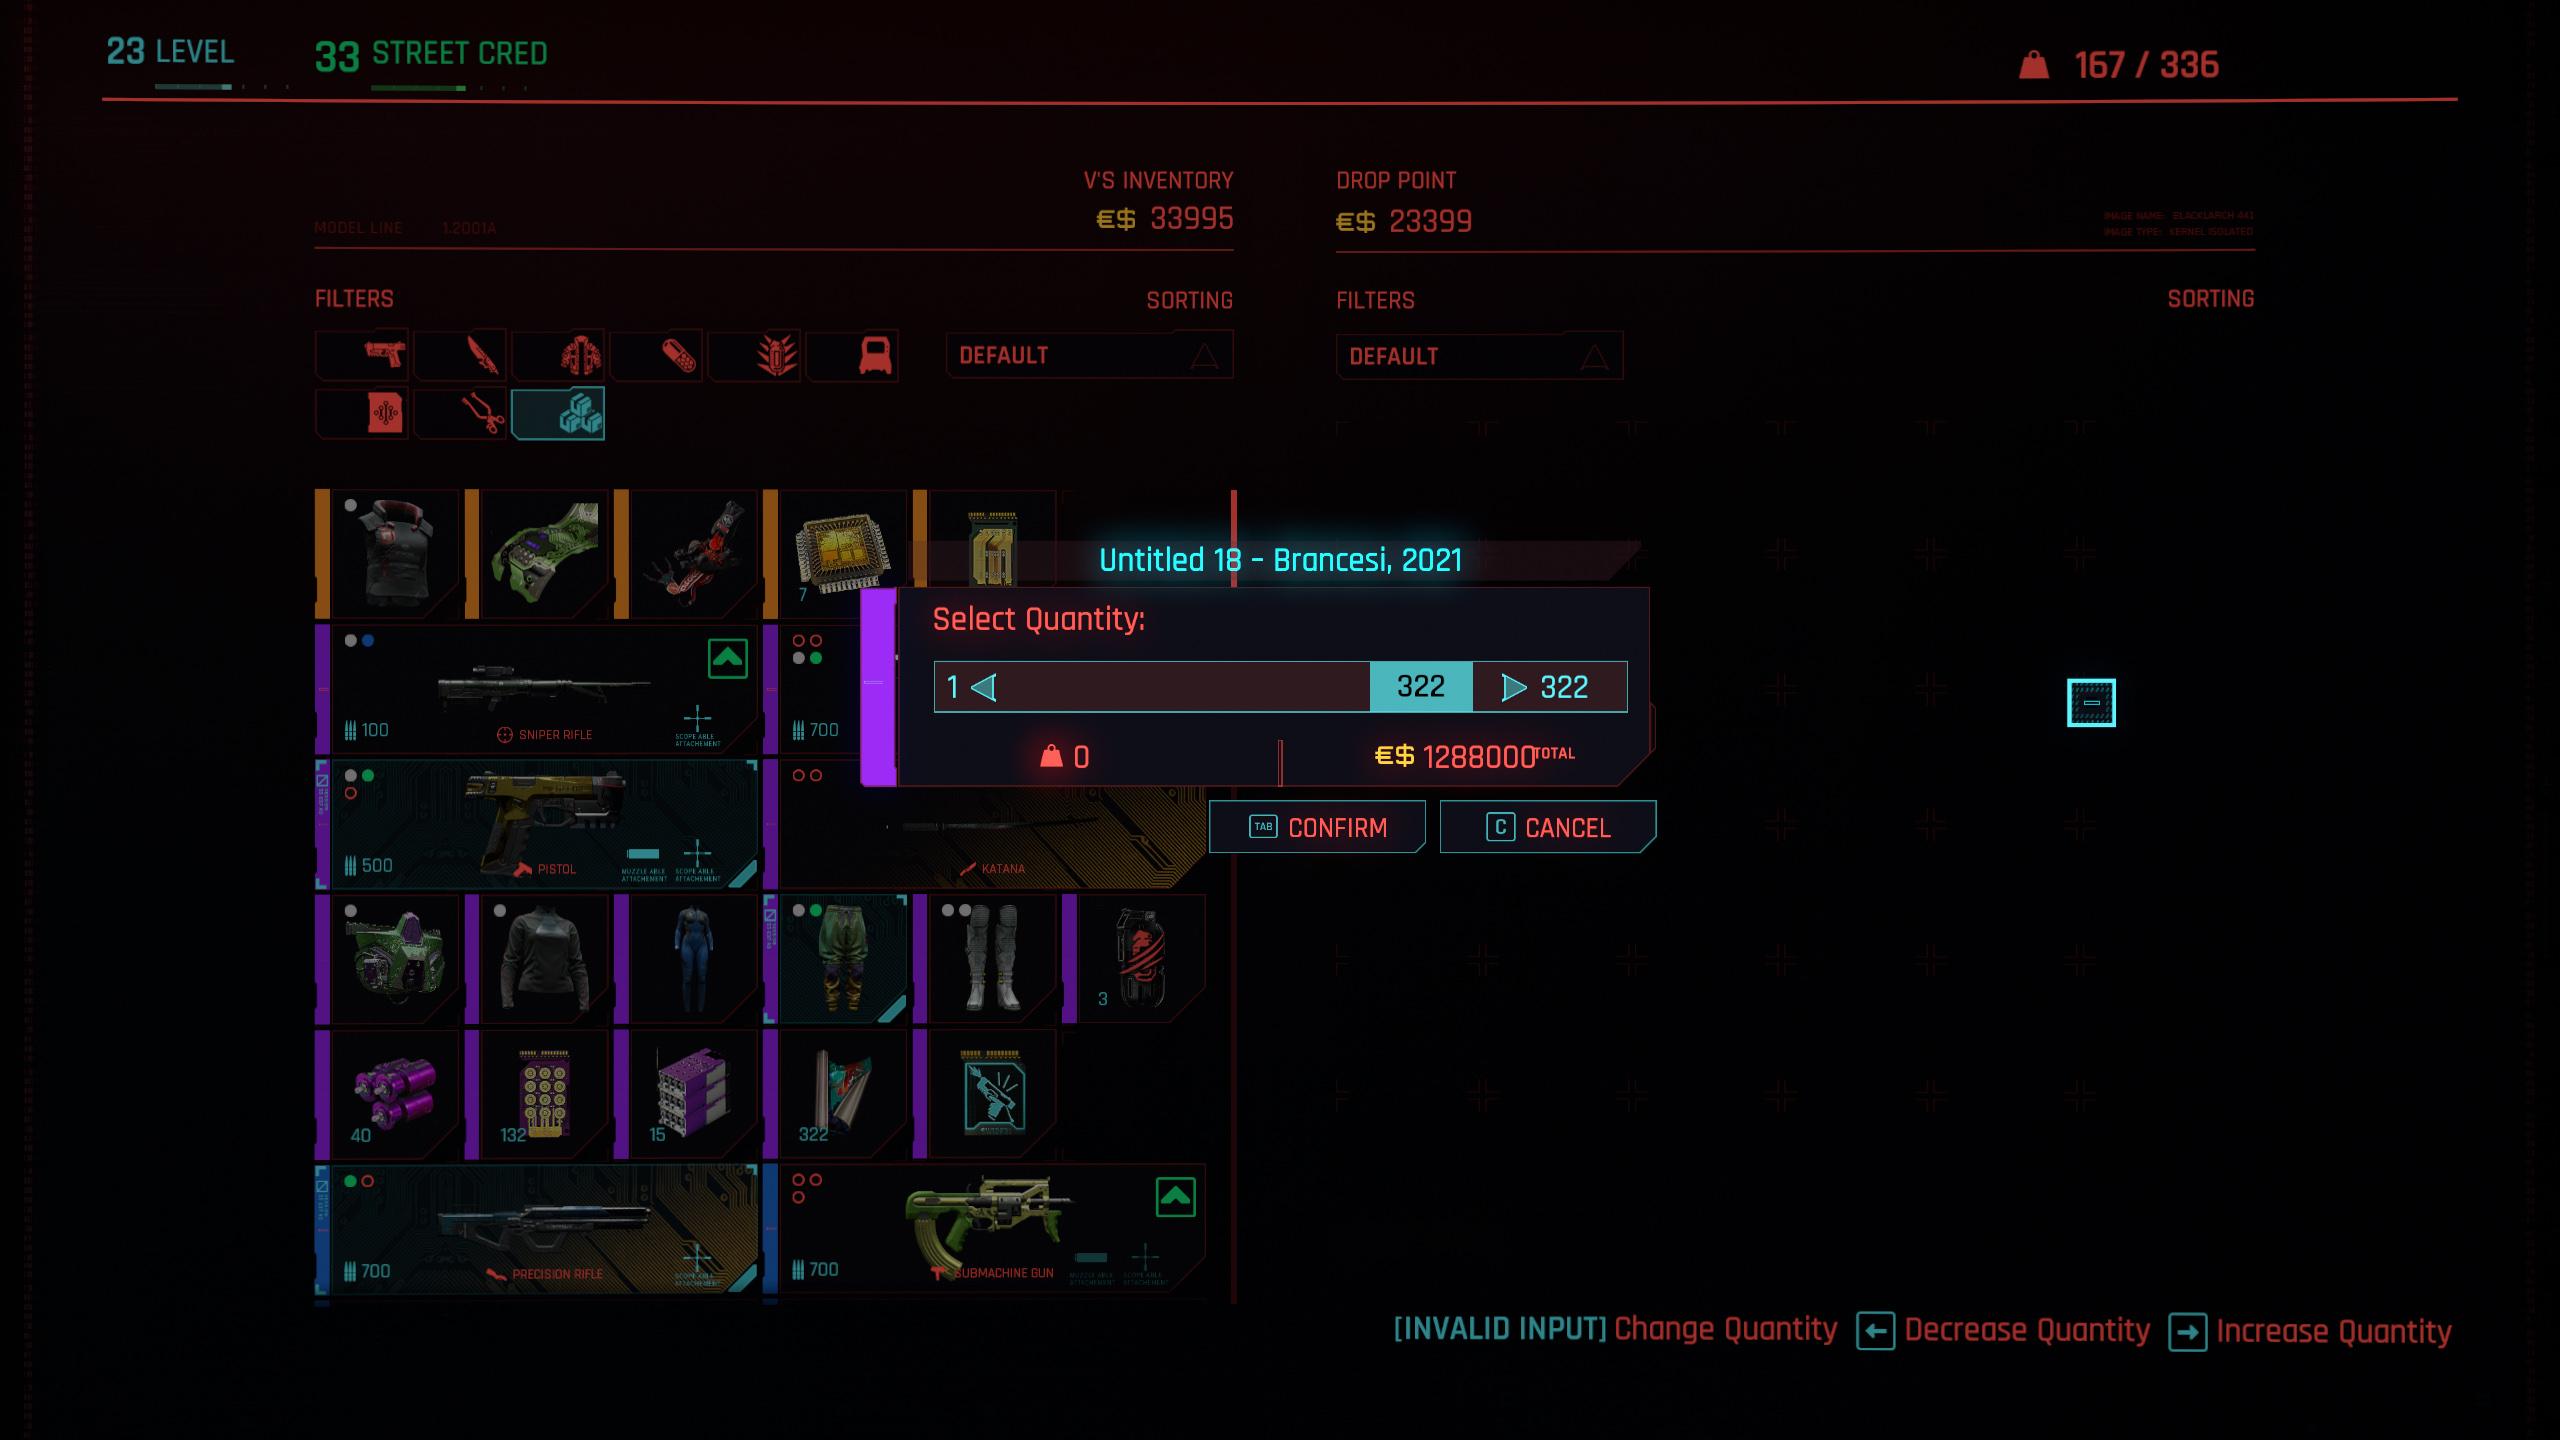 cyberpunk 2077 money glitch - selling duplicate items